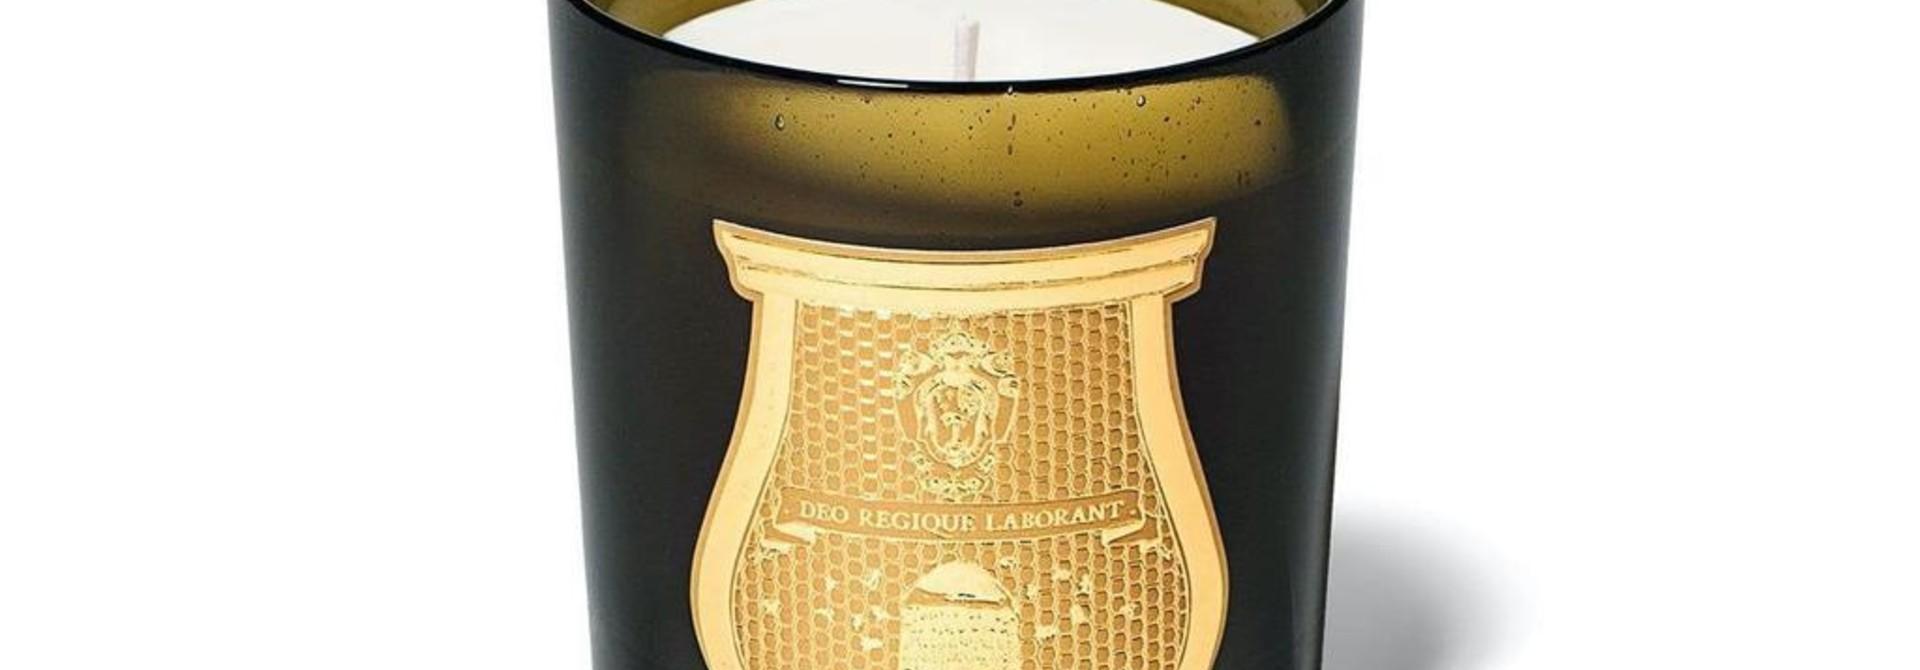 CIRE TRUDON - Candle Abdel Kader 270gr